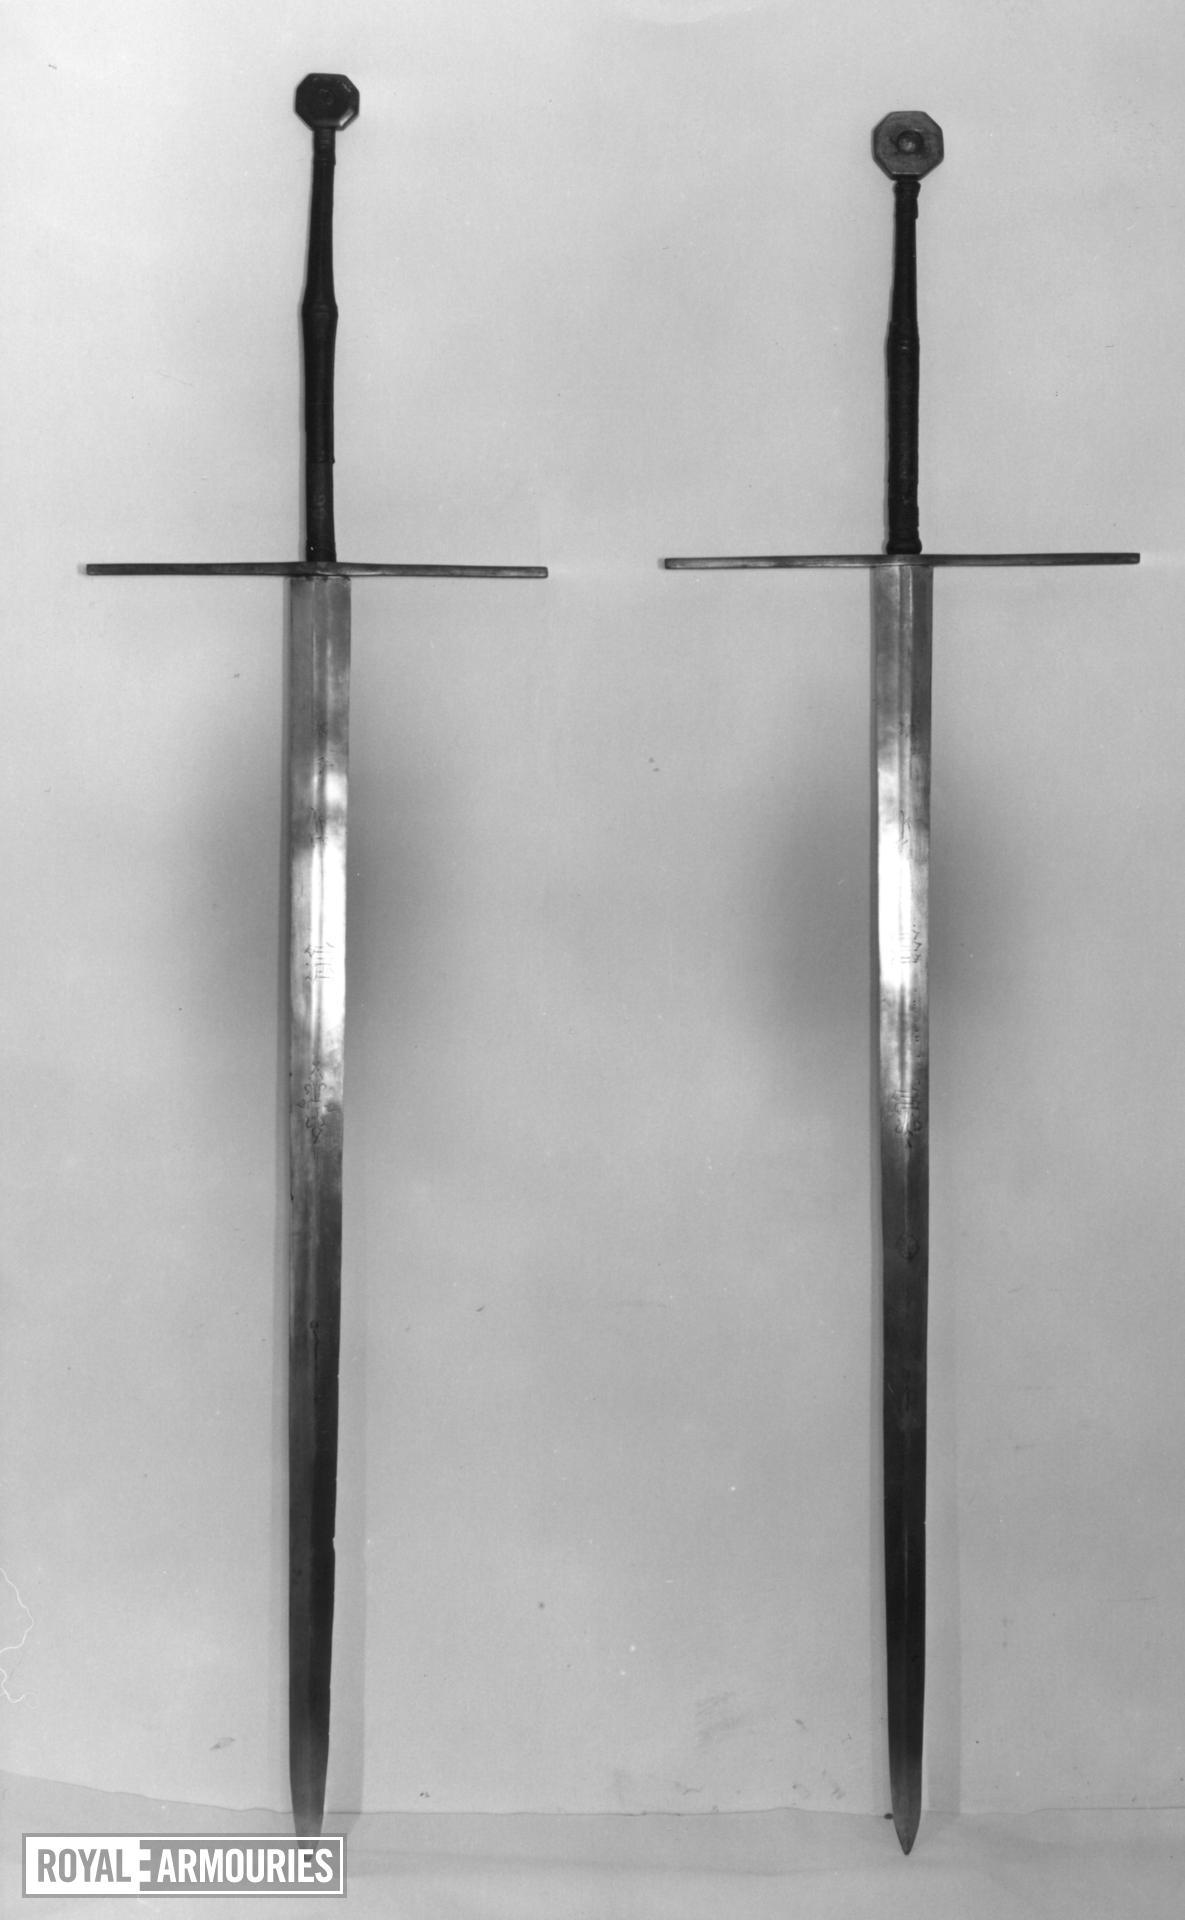 Bearing sword Two-hand bearing Sword. Probably an English royal processional sword